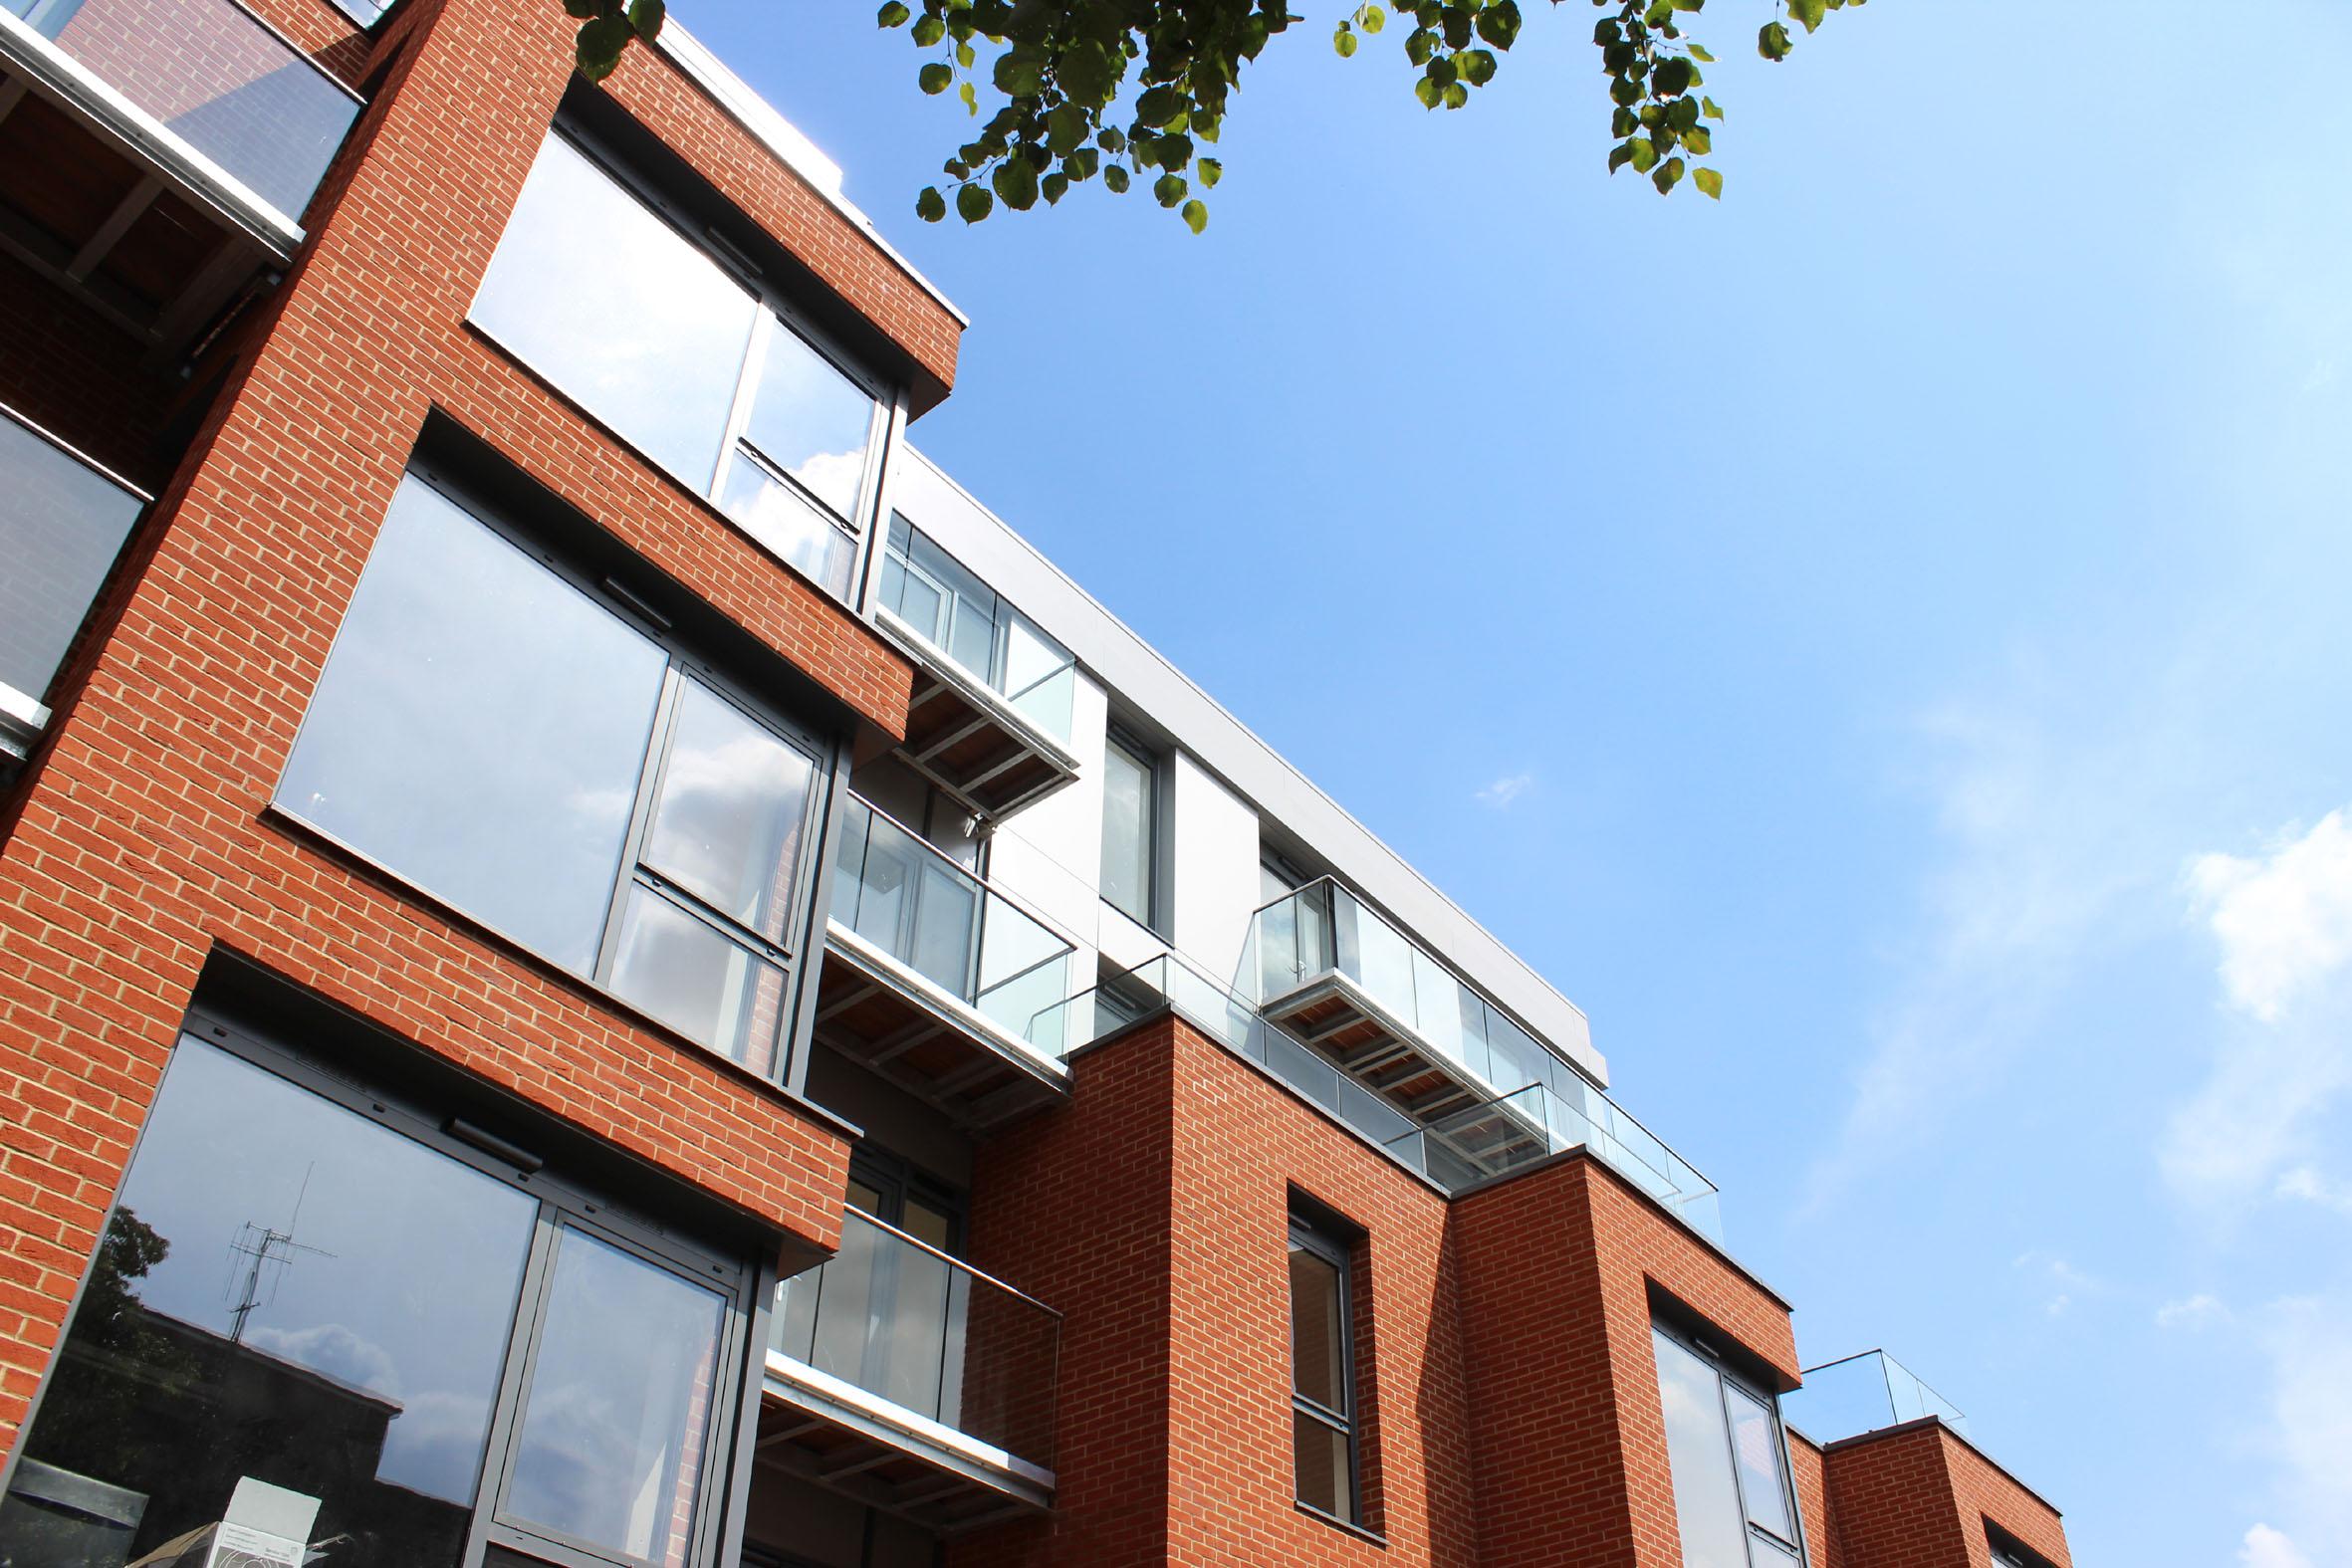 Sapphire Balconies complement character of London's 'Macaulay Walk'